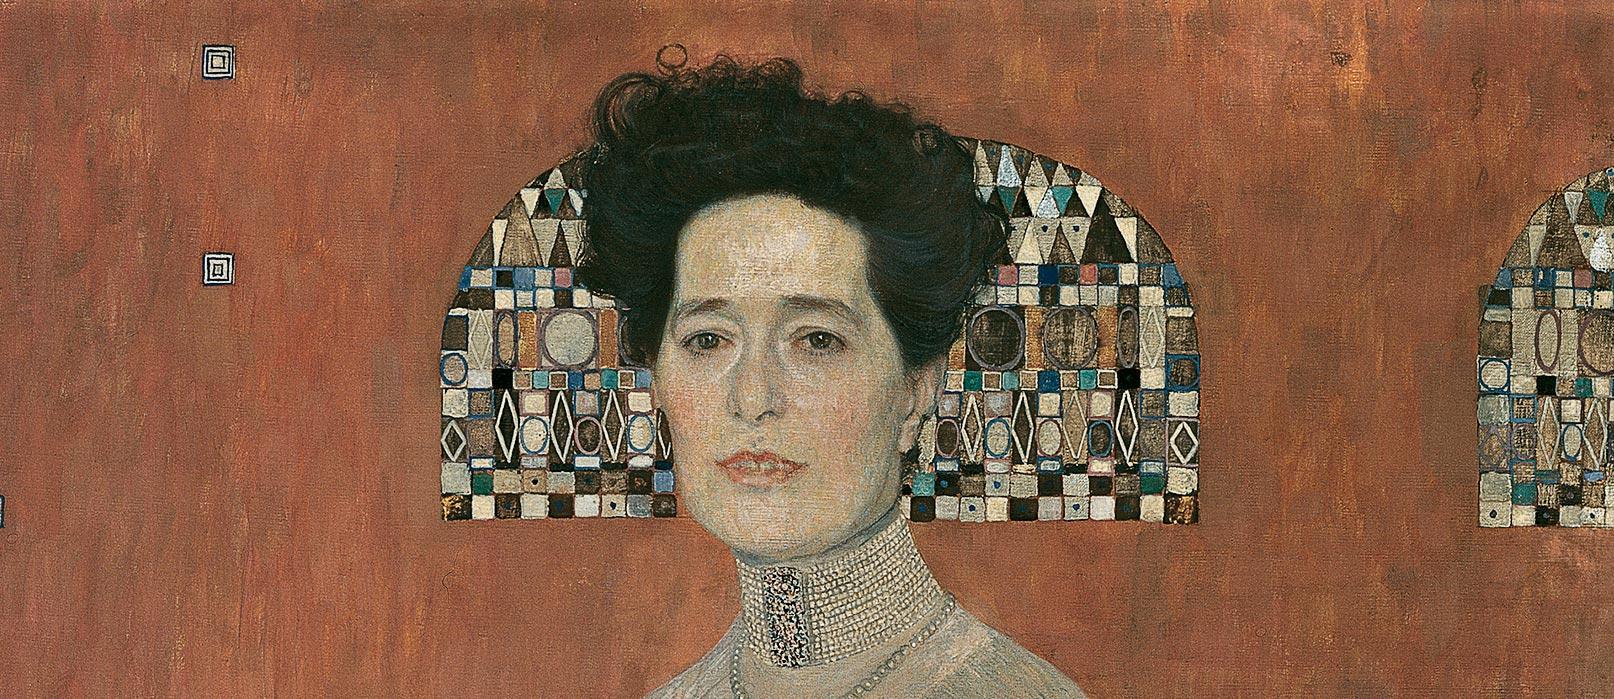 modernism vienna klimt and feminism essay